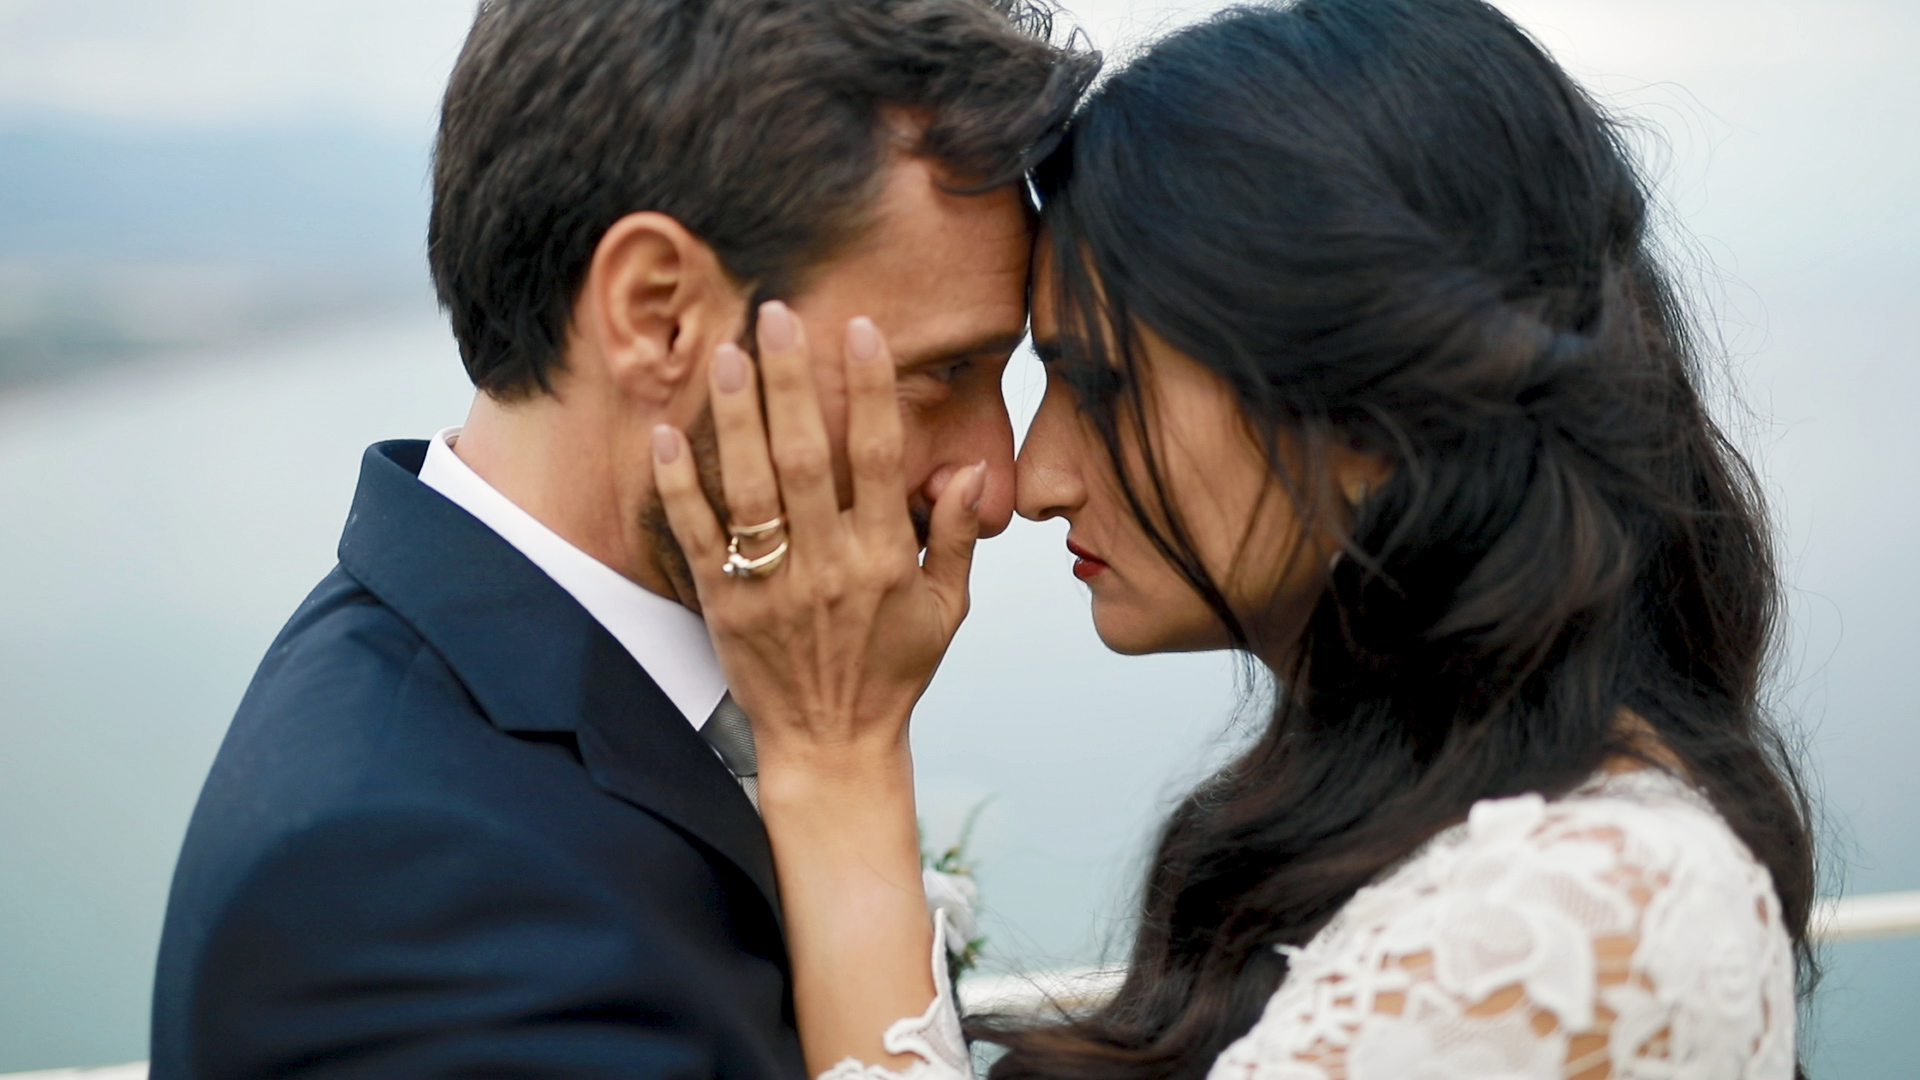 Marco e Giulia videofilm matrimonio Gianluca Longo